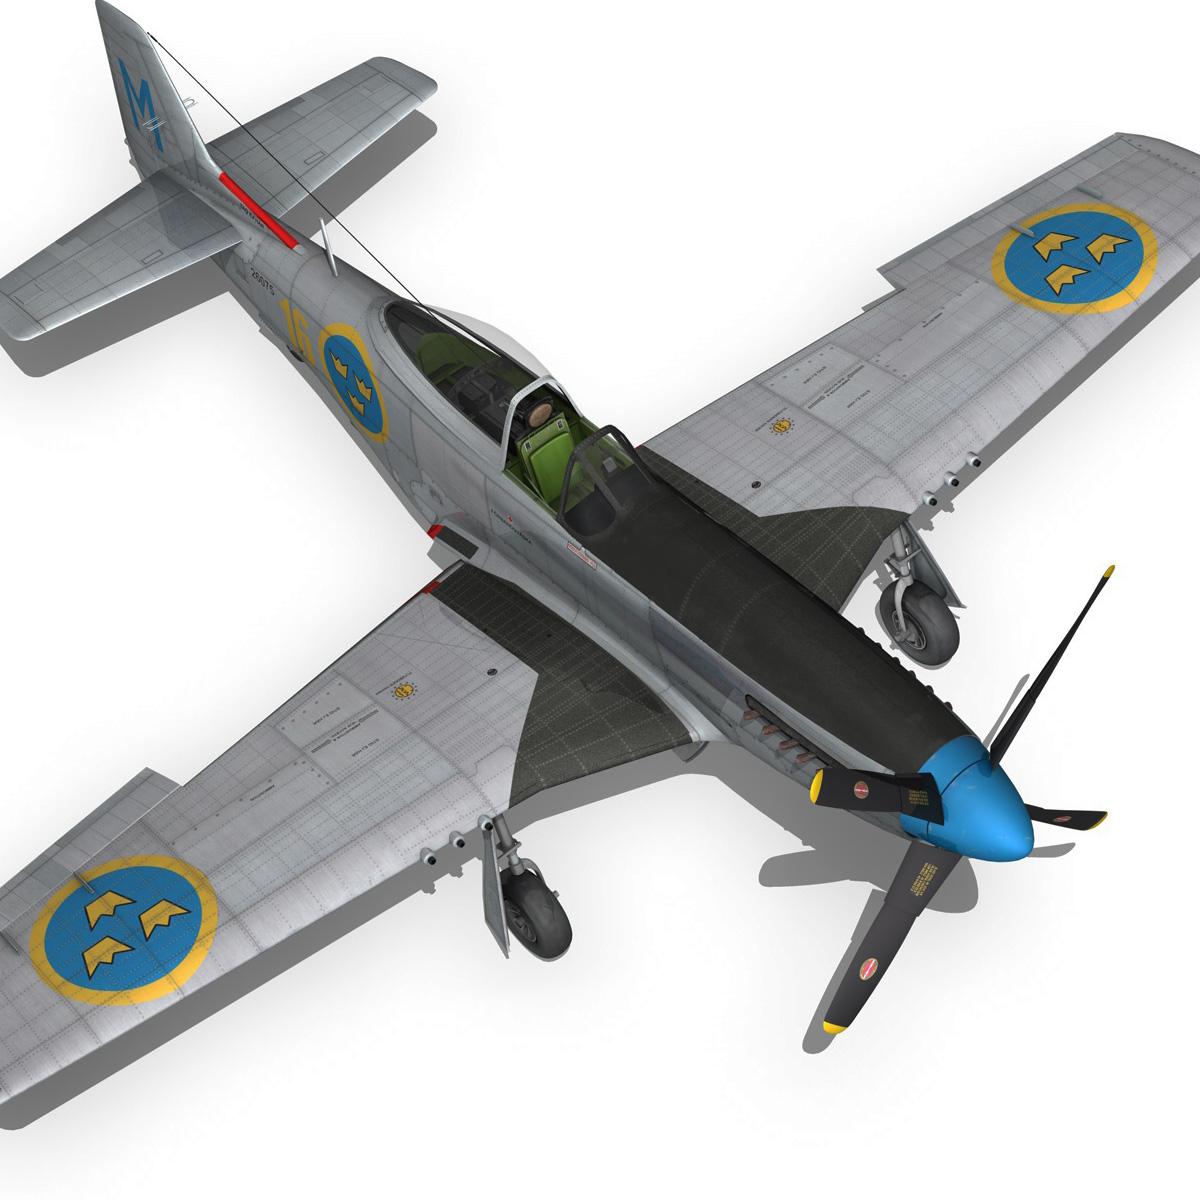 north american p-51d mustang – swedisch airforce 3d model fbx c4d lwo obj 268241